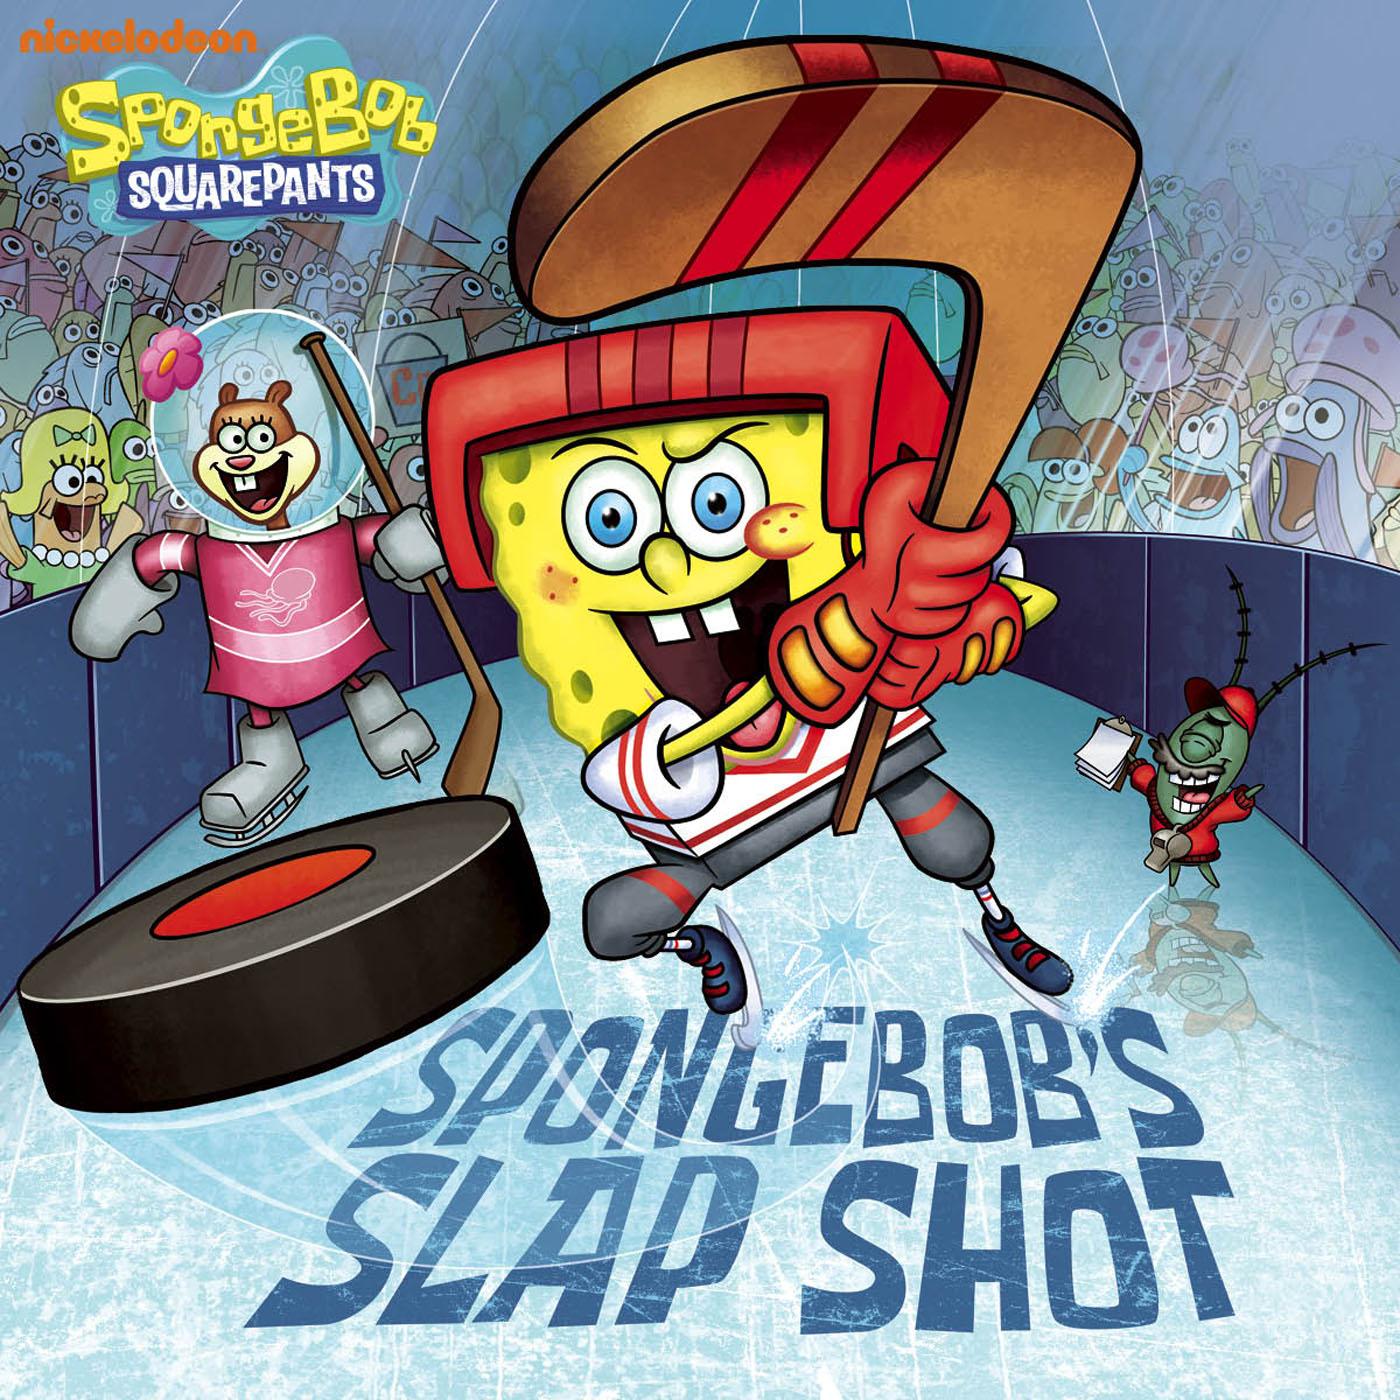 SpongeBob's Slap Shot